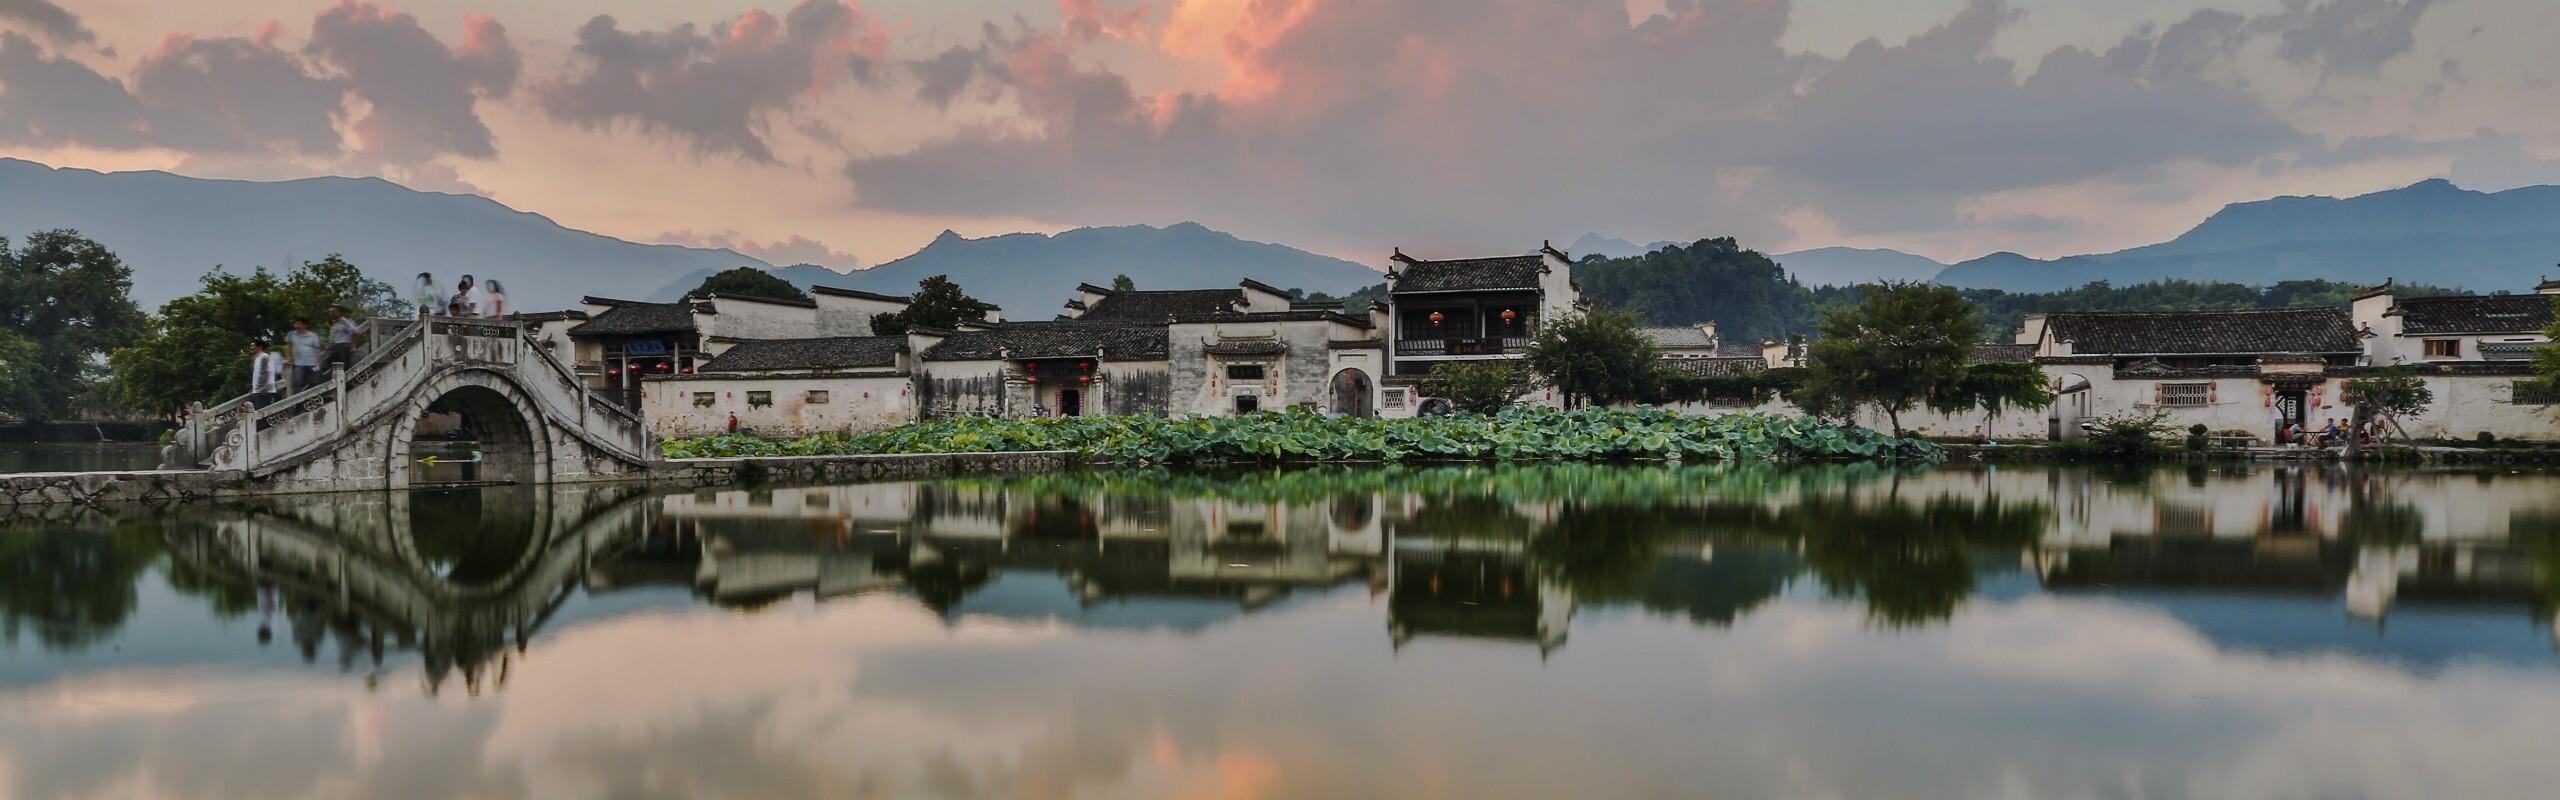 Huangshan Spotlight Experiences